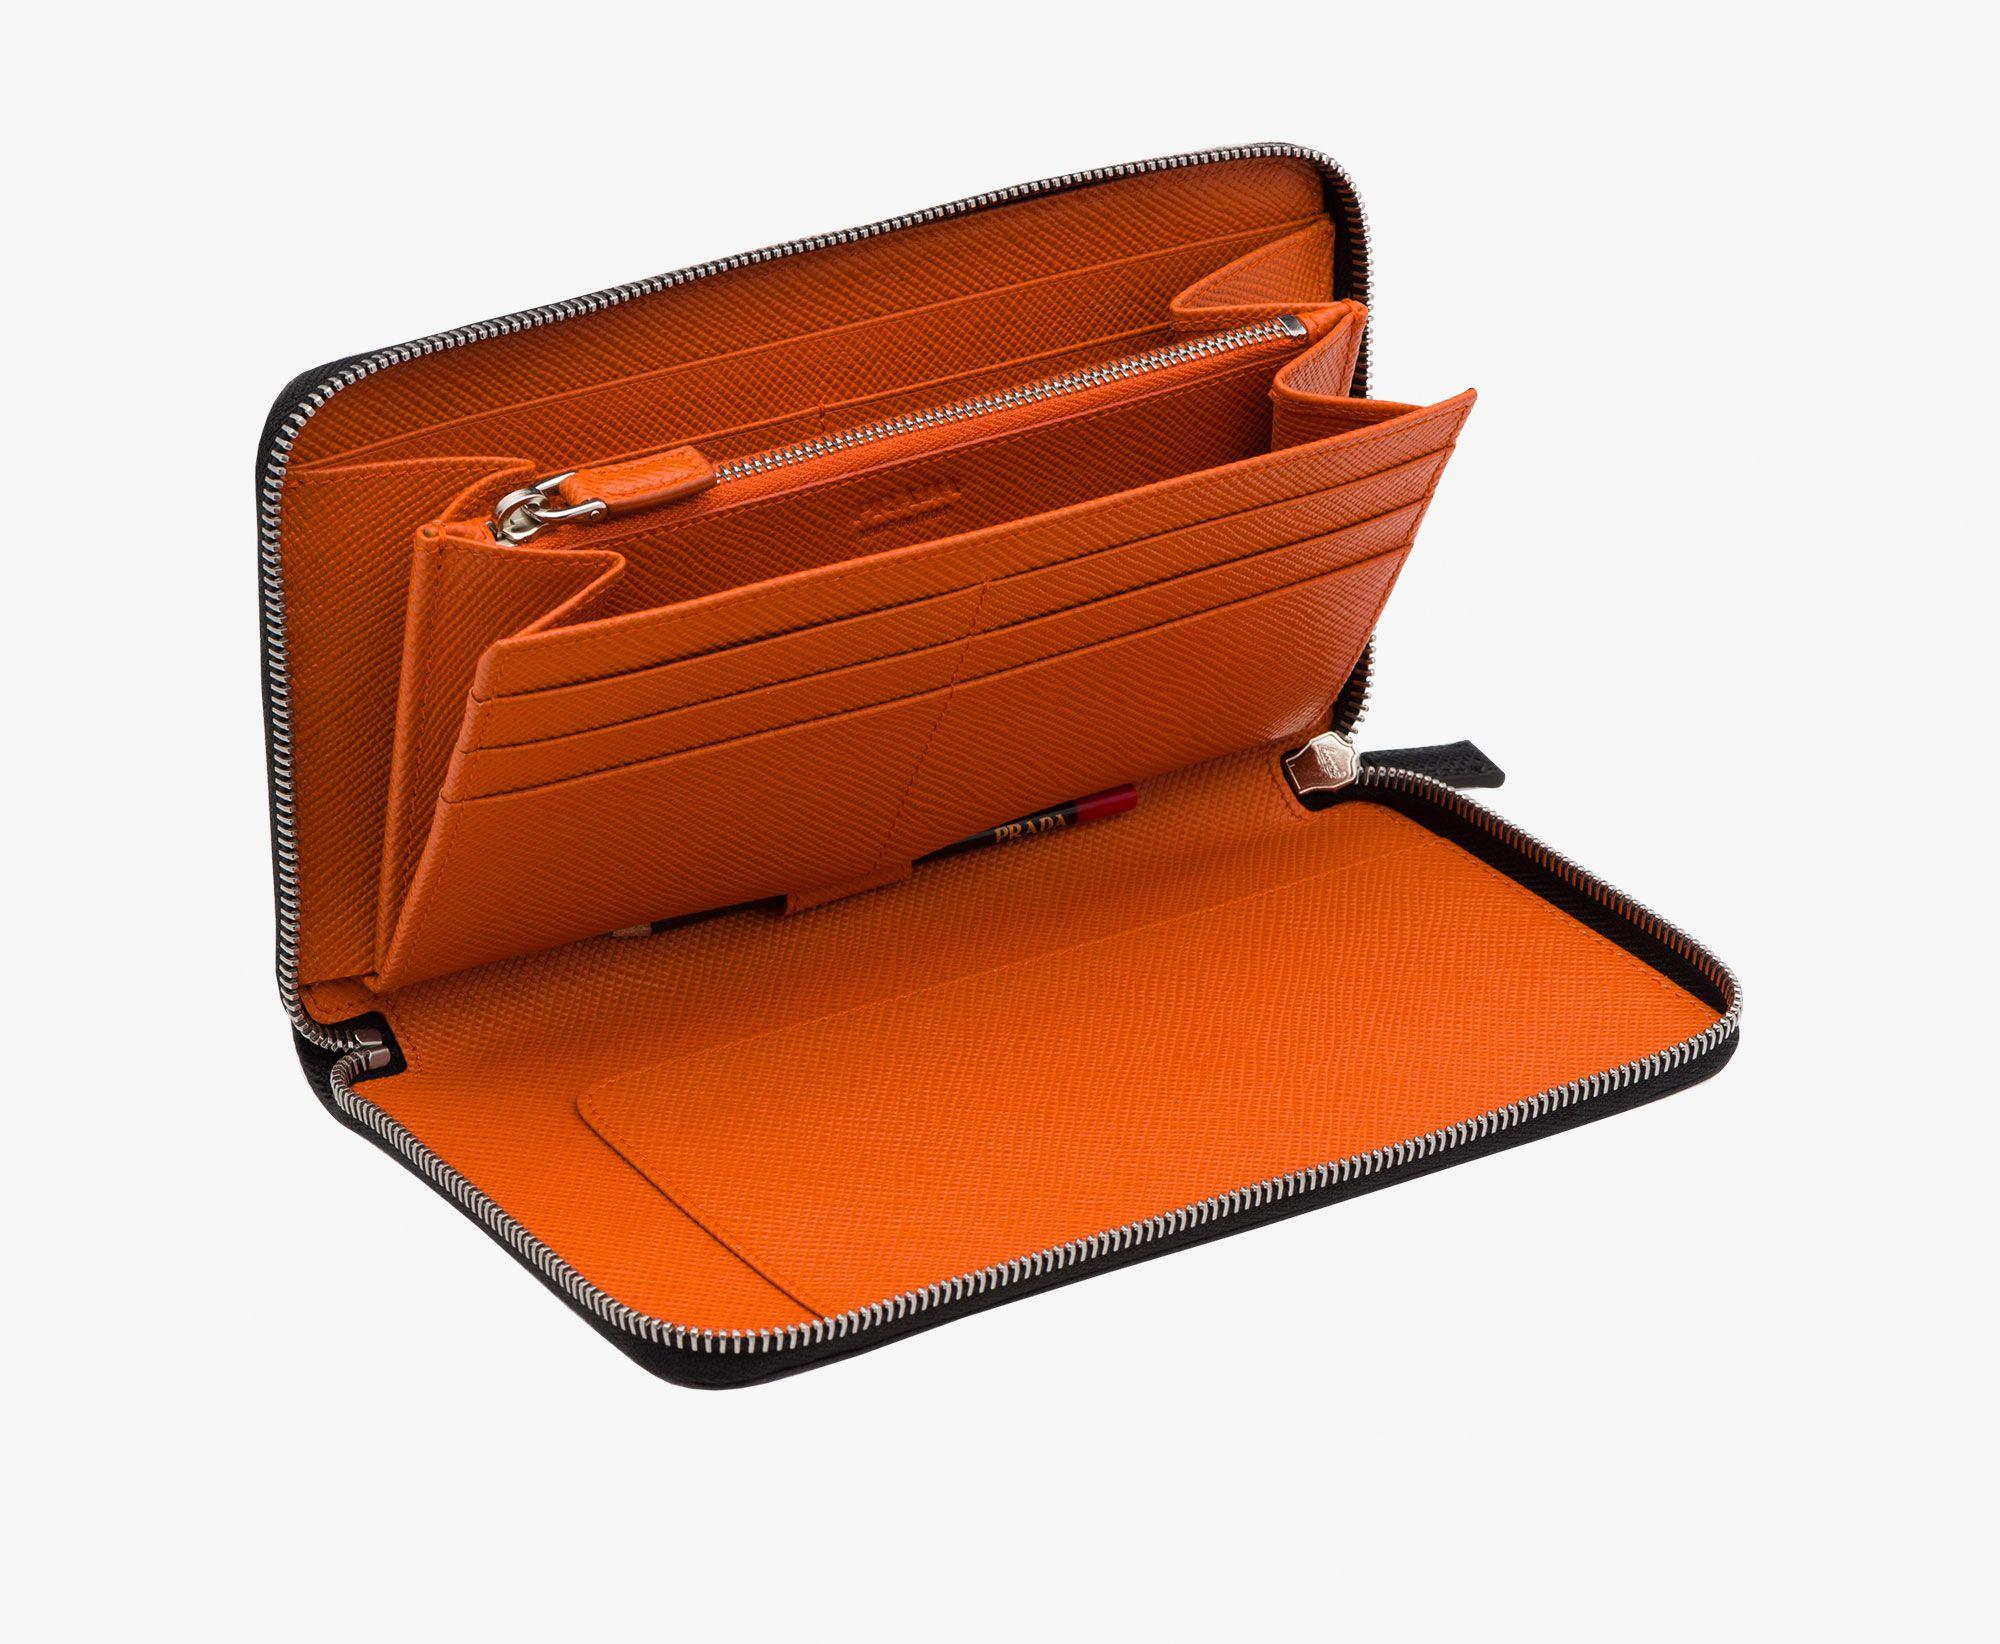 Prada Man Document holder in Black+papaya (orange) 520 EUR. Saffiano ...